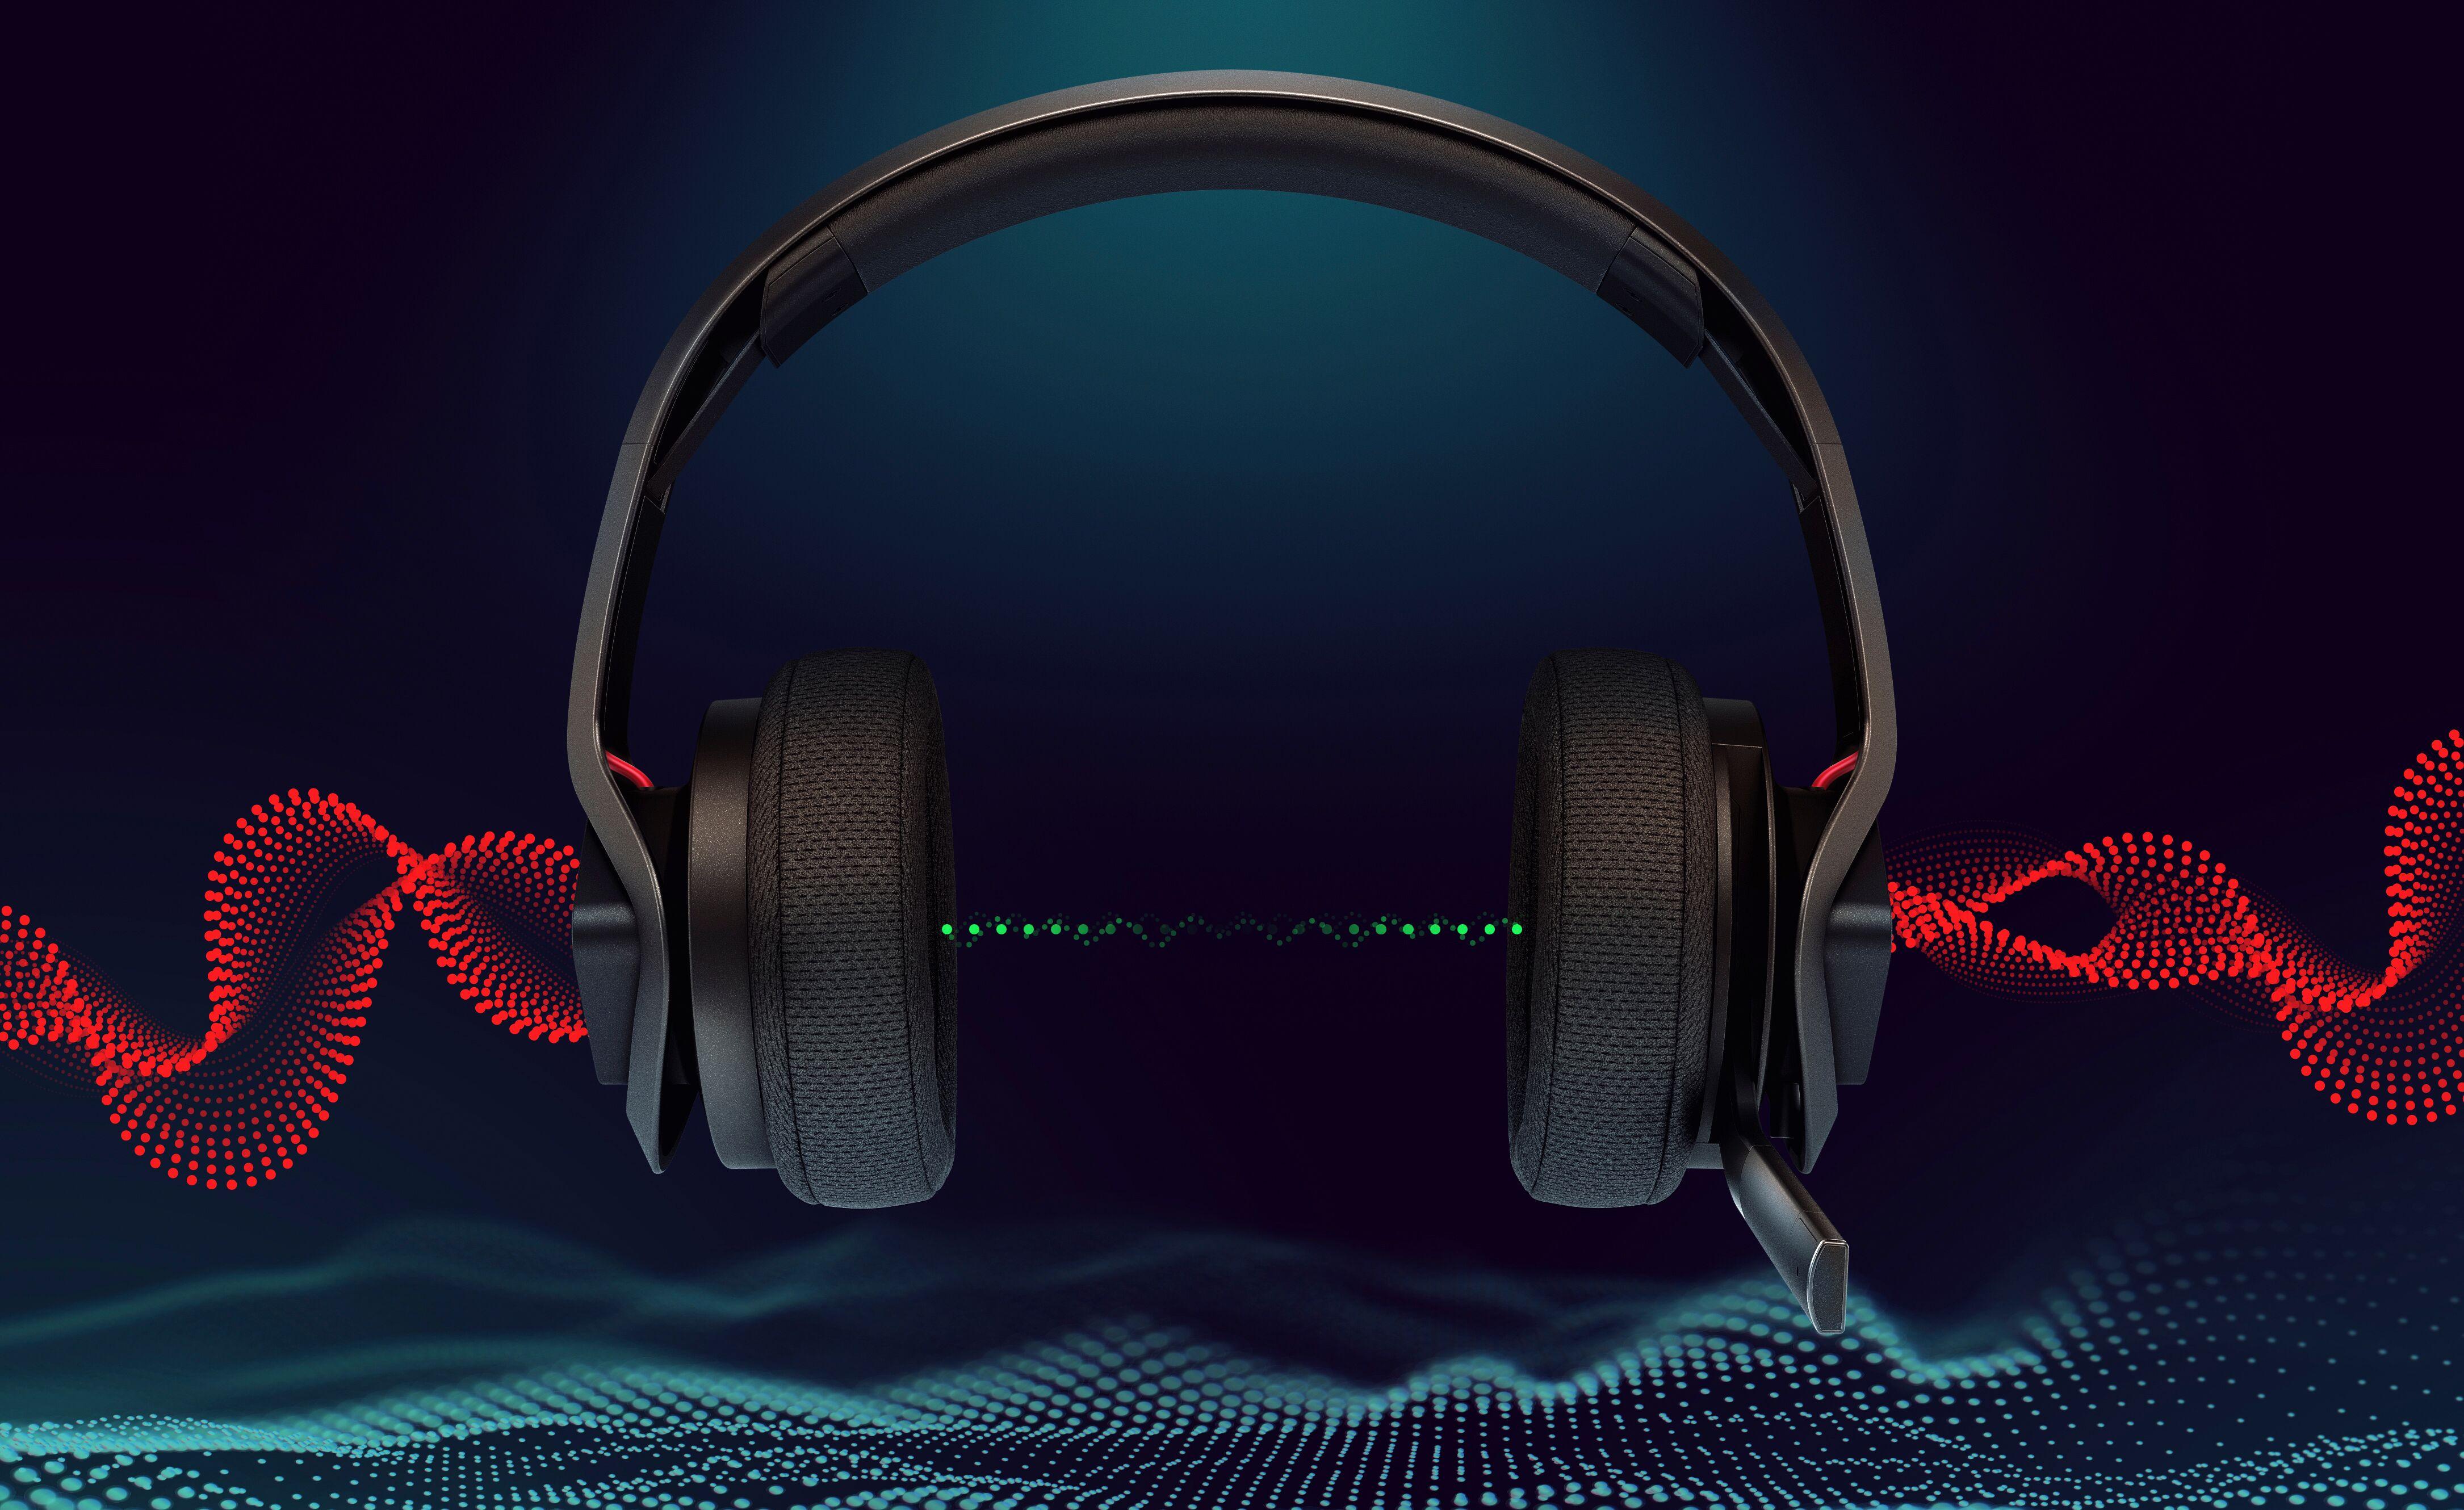 Gamescom 2019 - Mindframe Prime Headset 12 - Hynerd.it